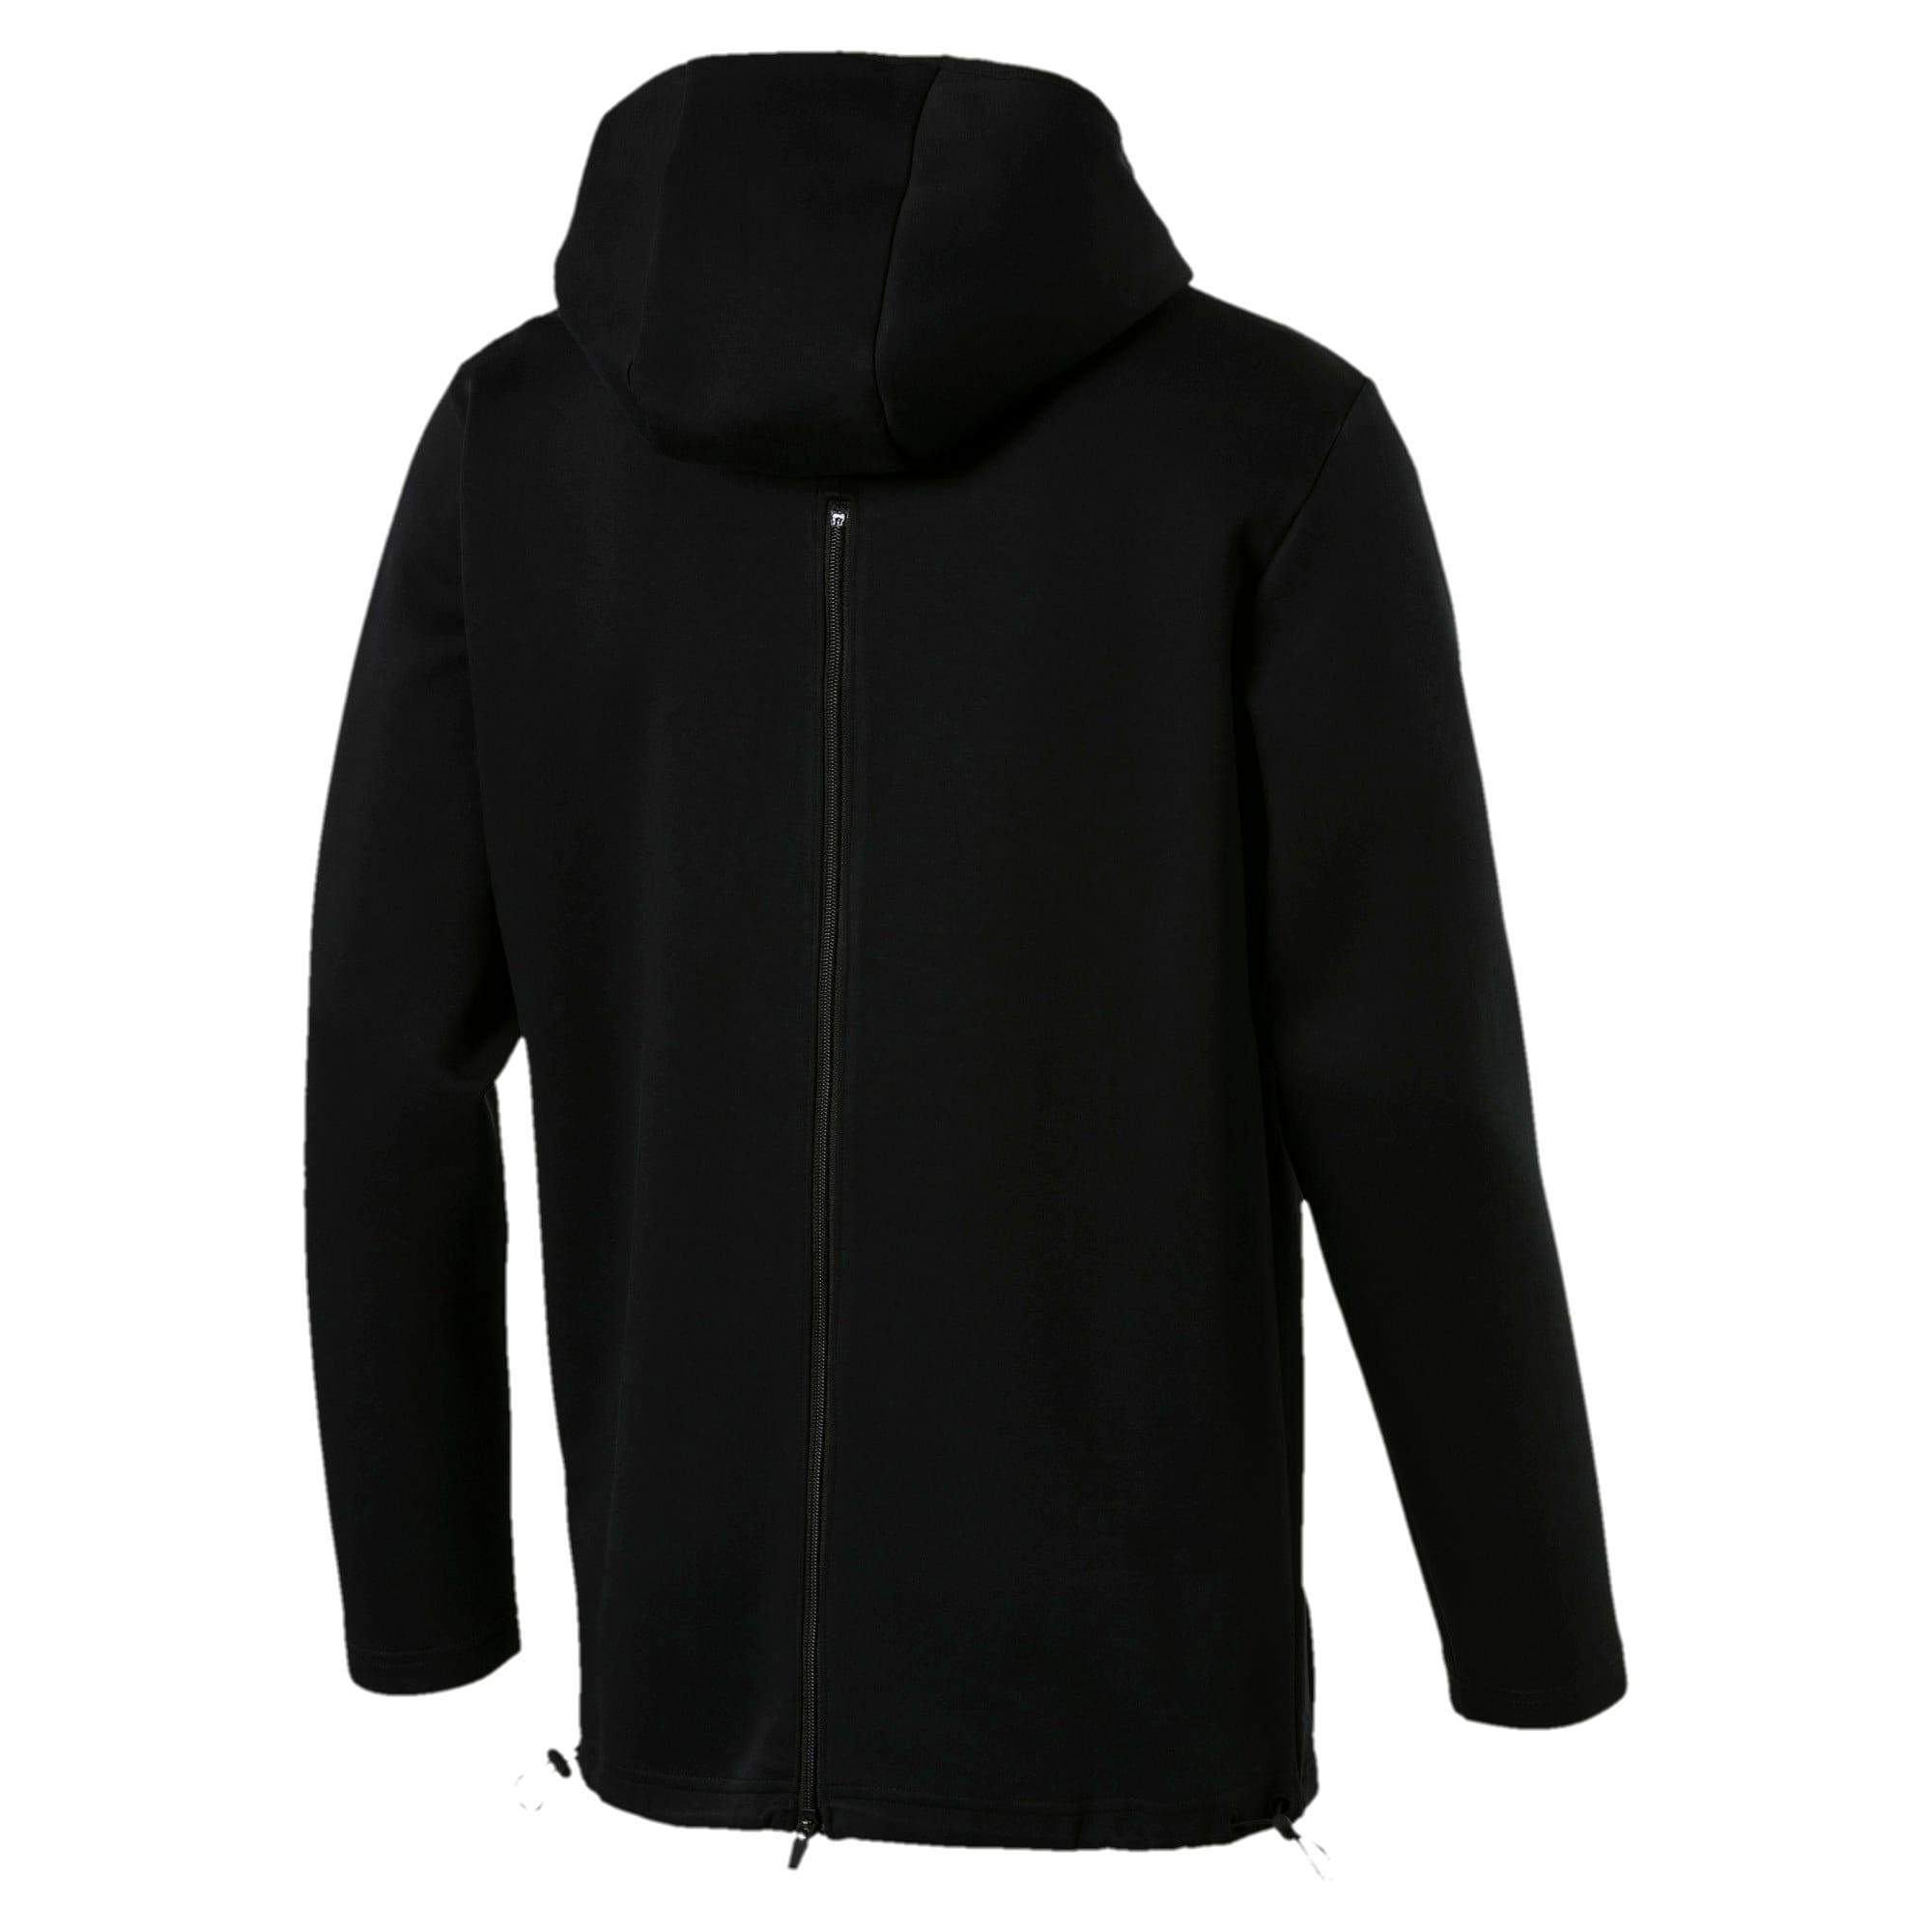 Thumbnail 3 of VENT Zip-Up Hooded Men's Jacket, Puma Black, medium